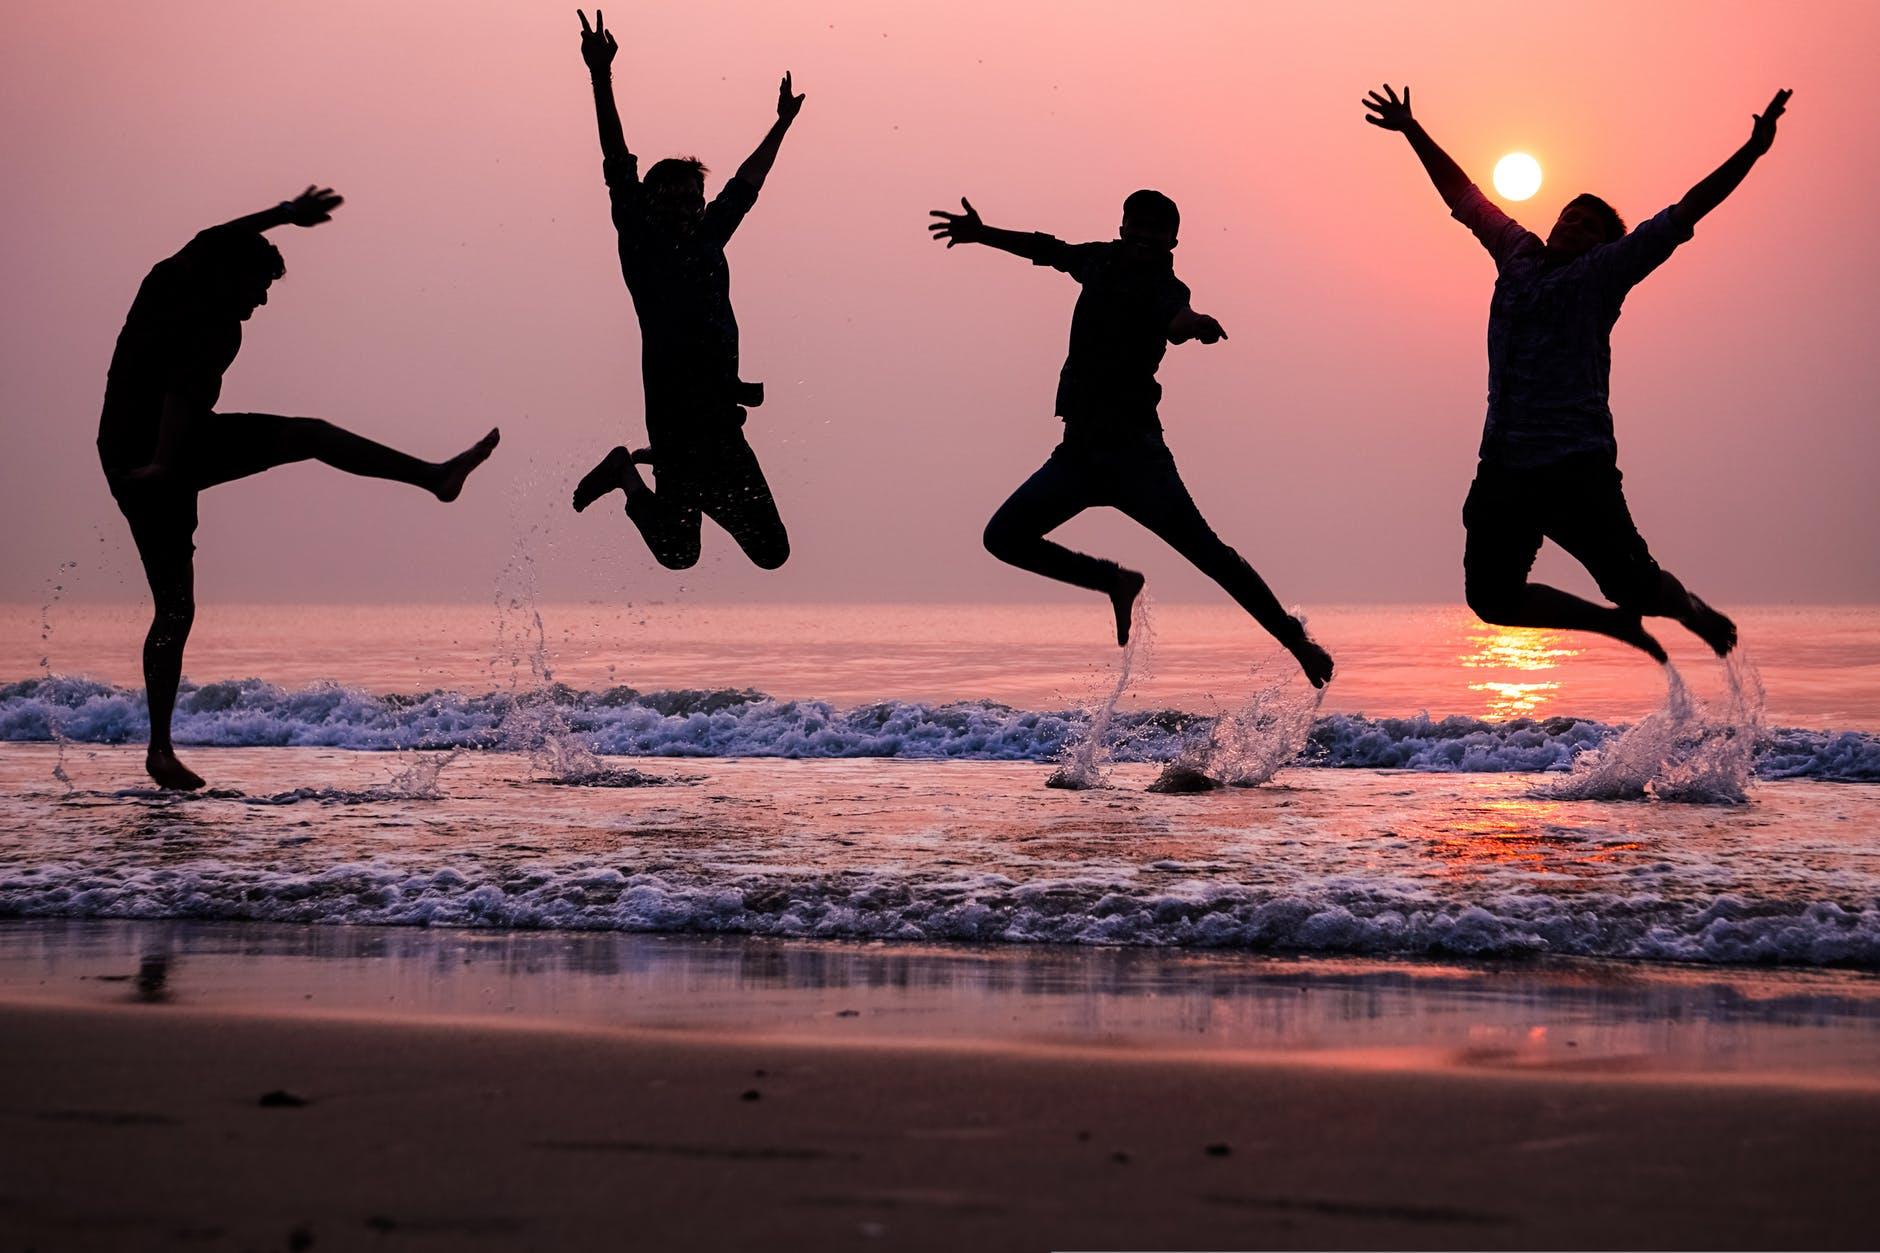 photo of people doing jump shot on beach